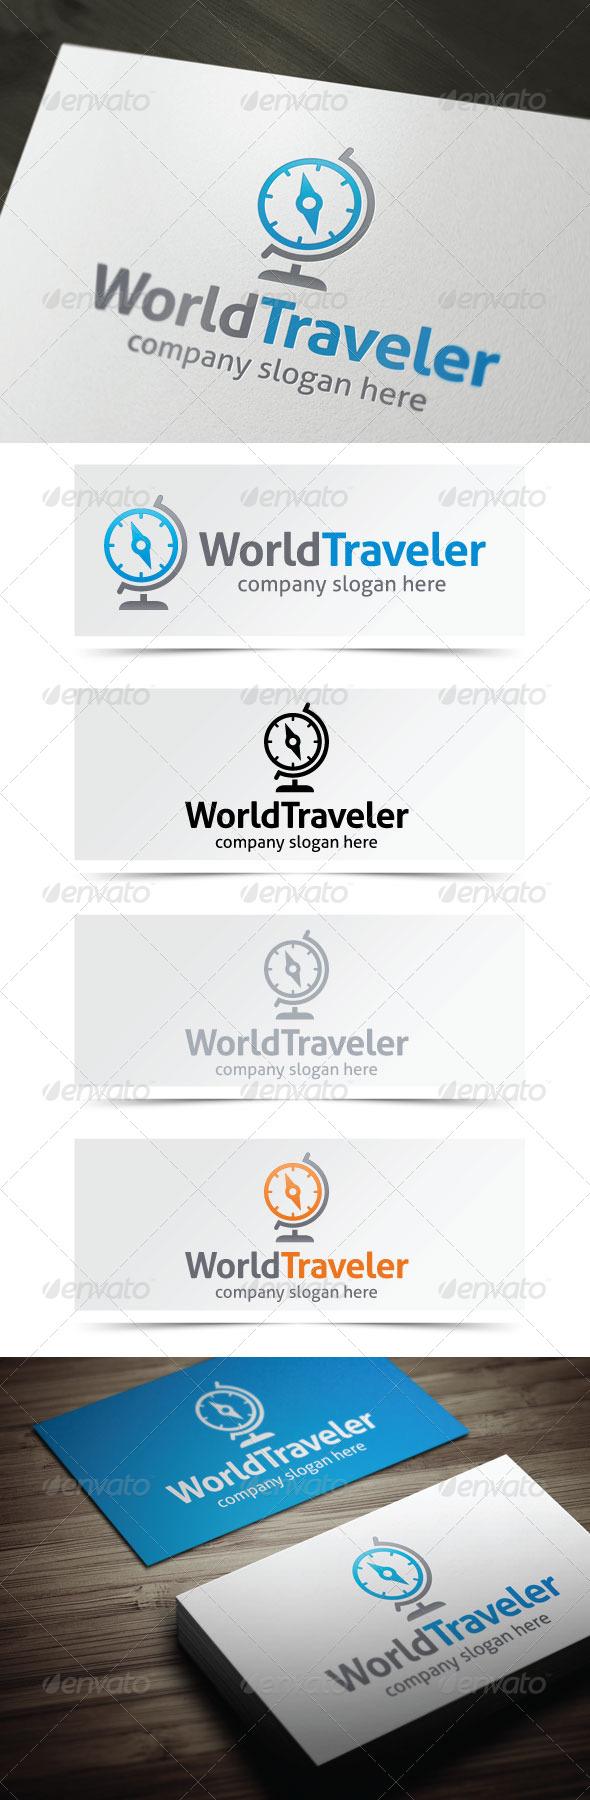 GraphicRiver World Traveler 4654439